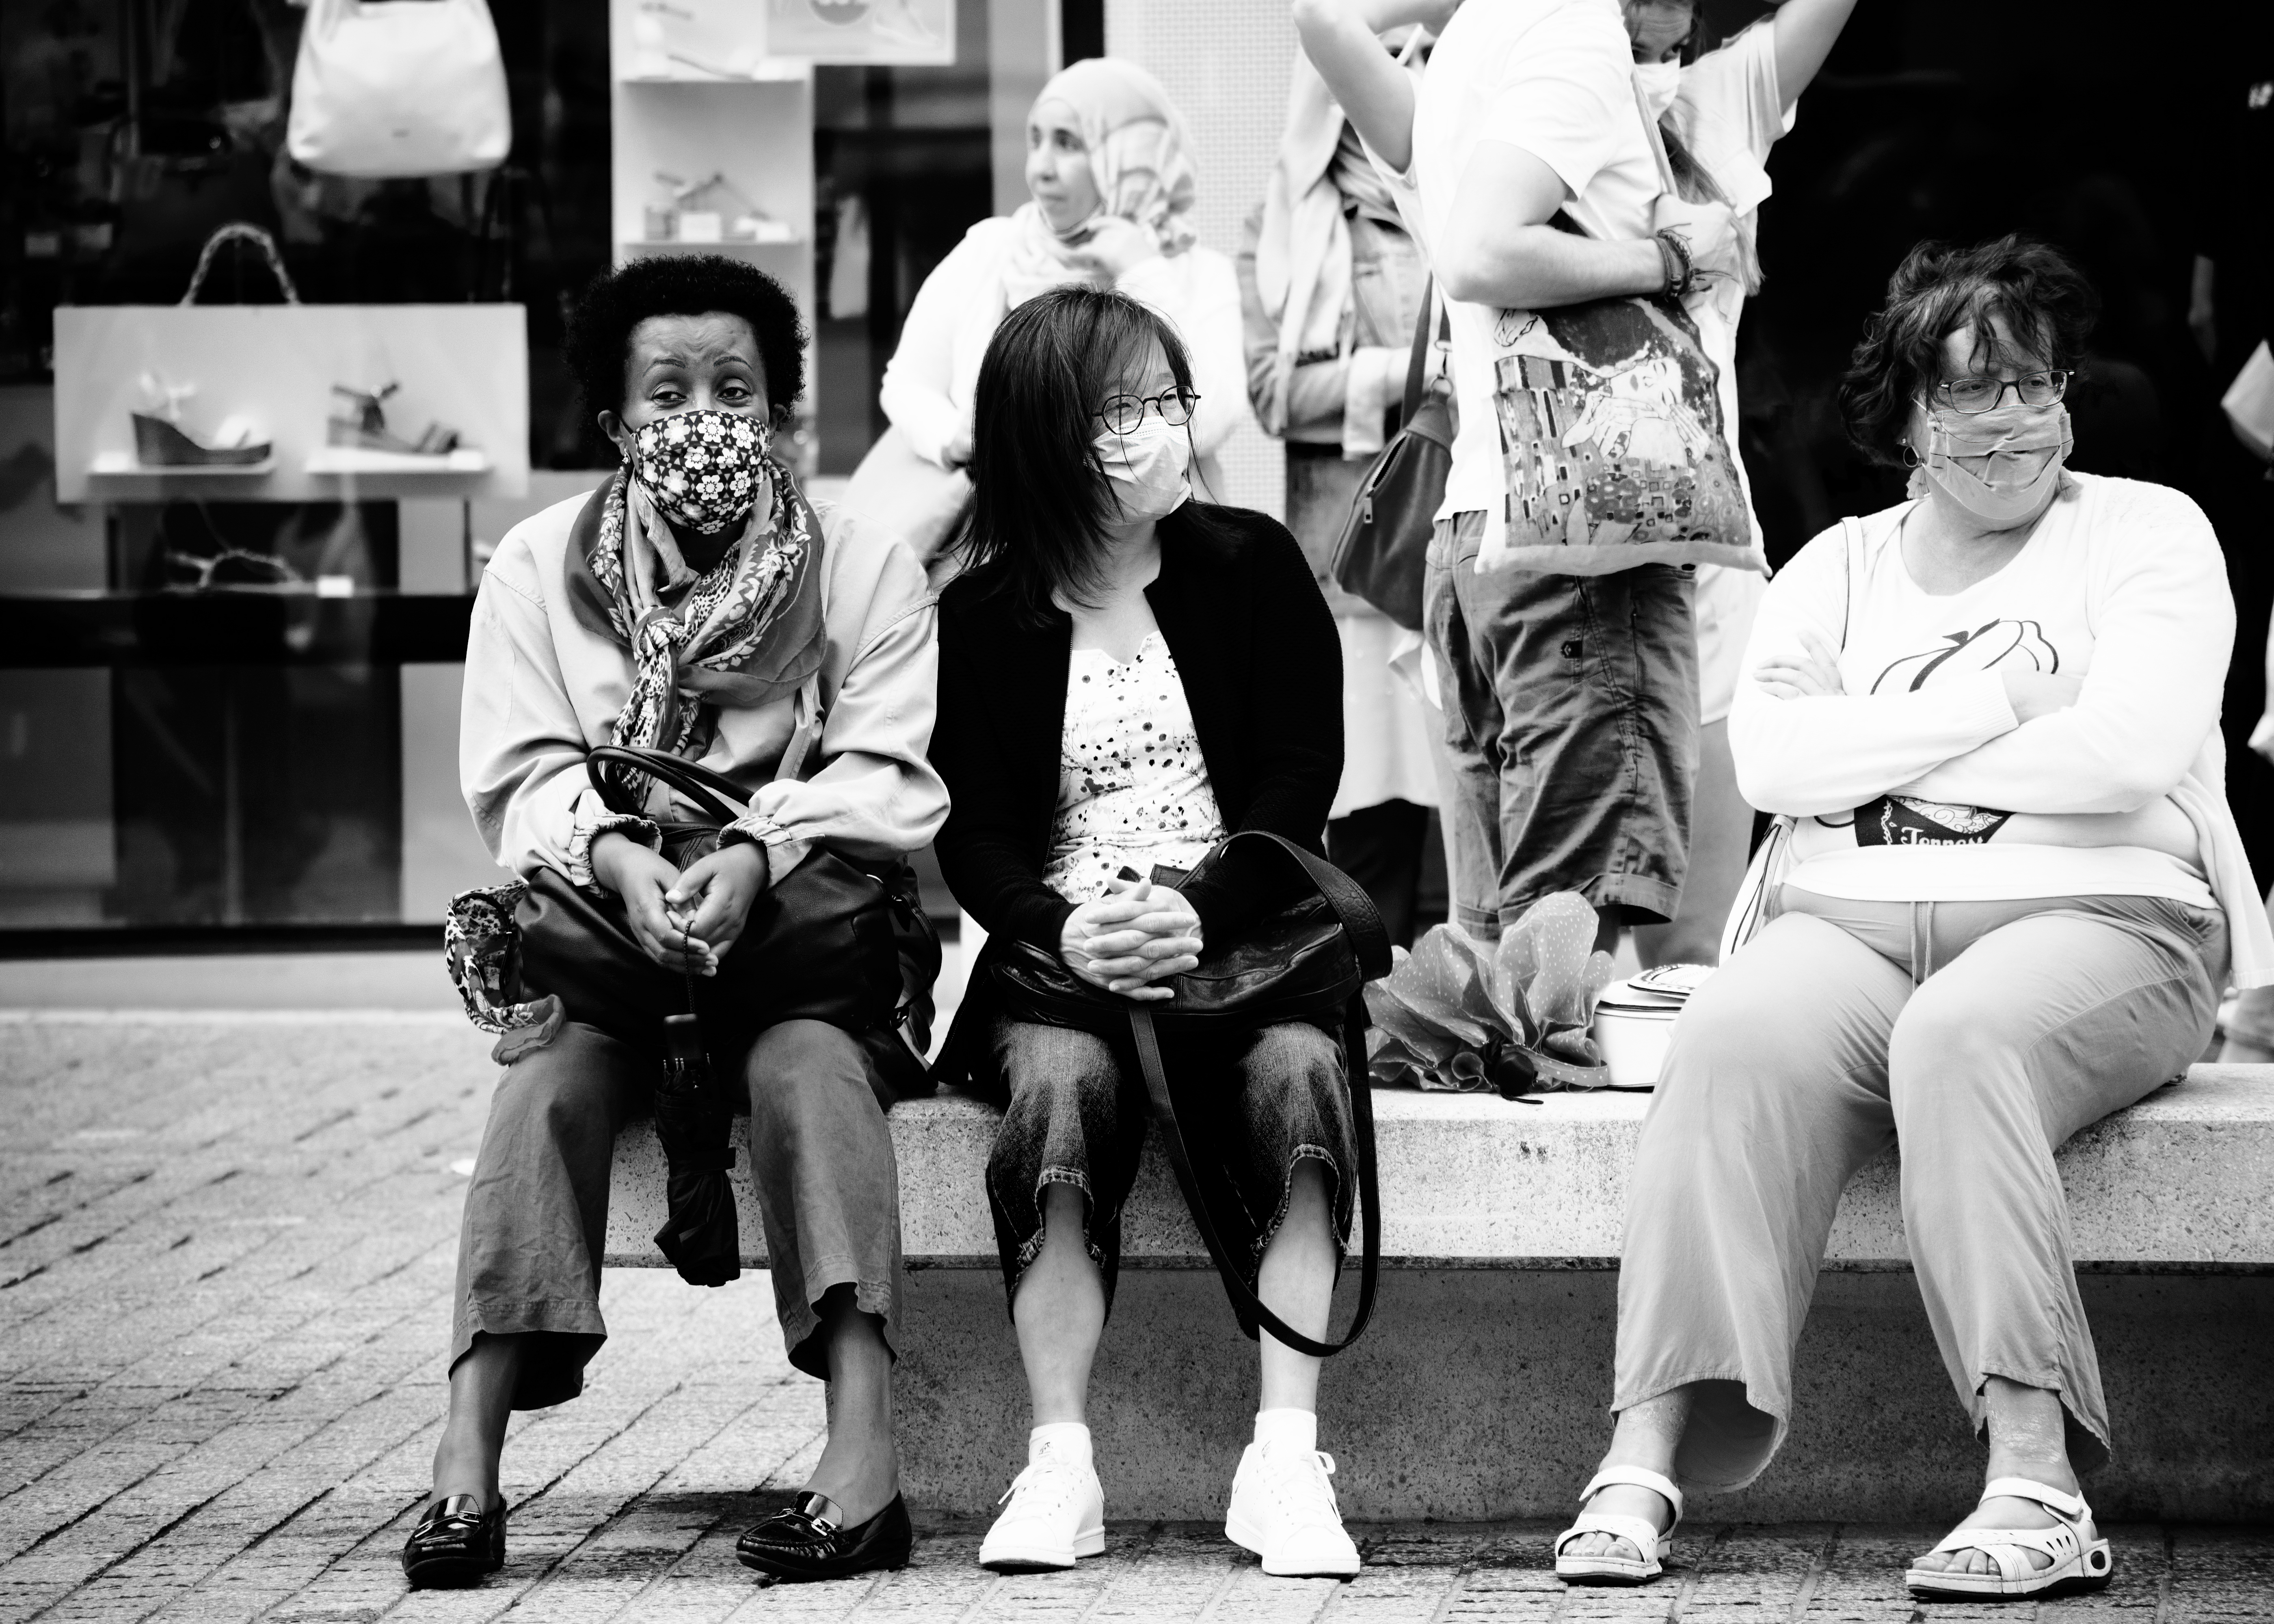 Aleksandra Rowicka street photography Brussels all lives matter